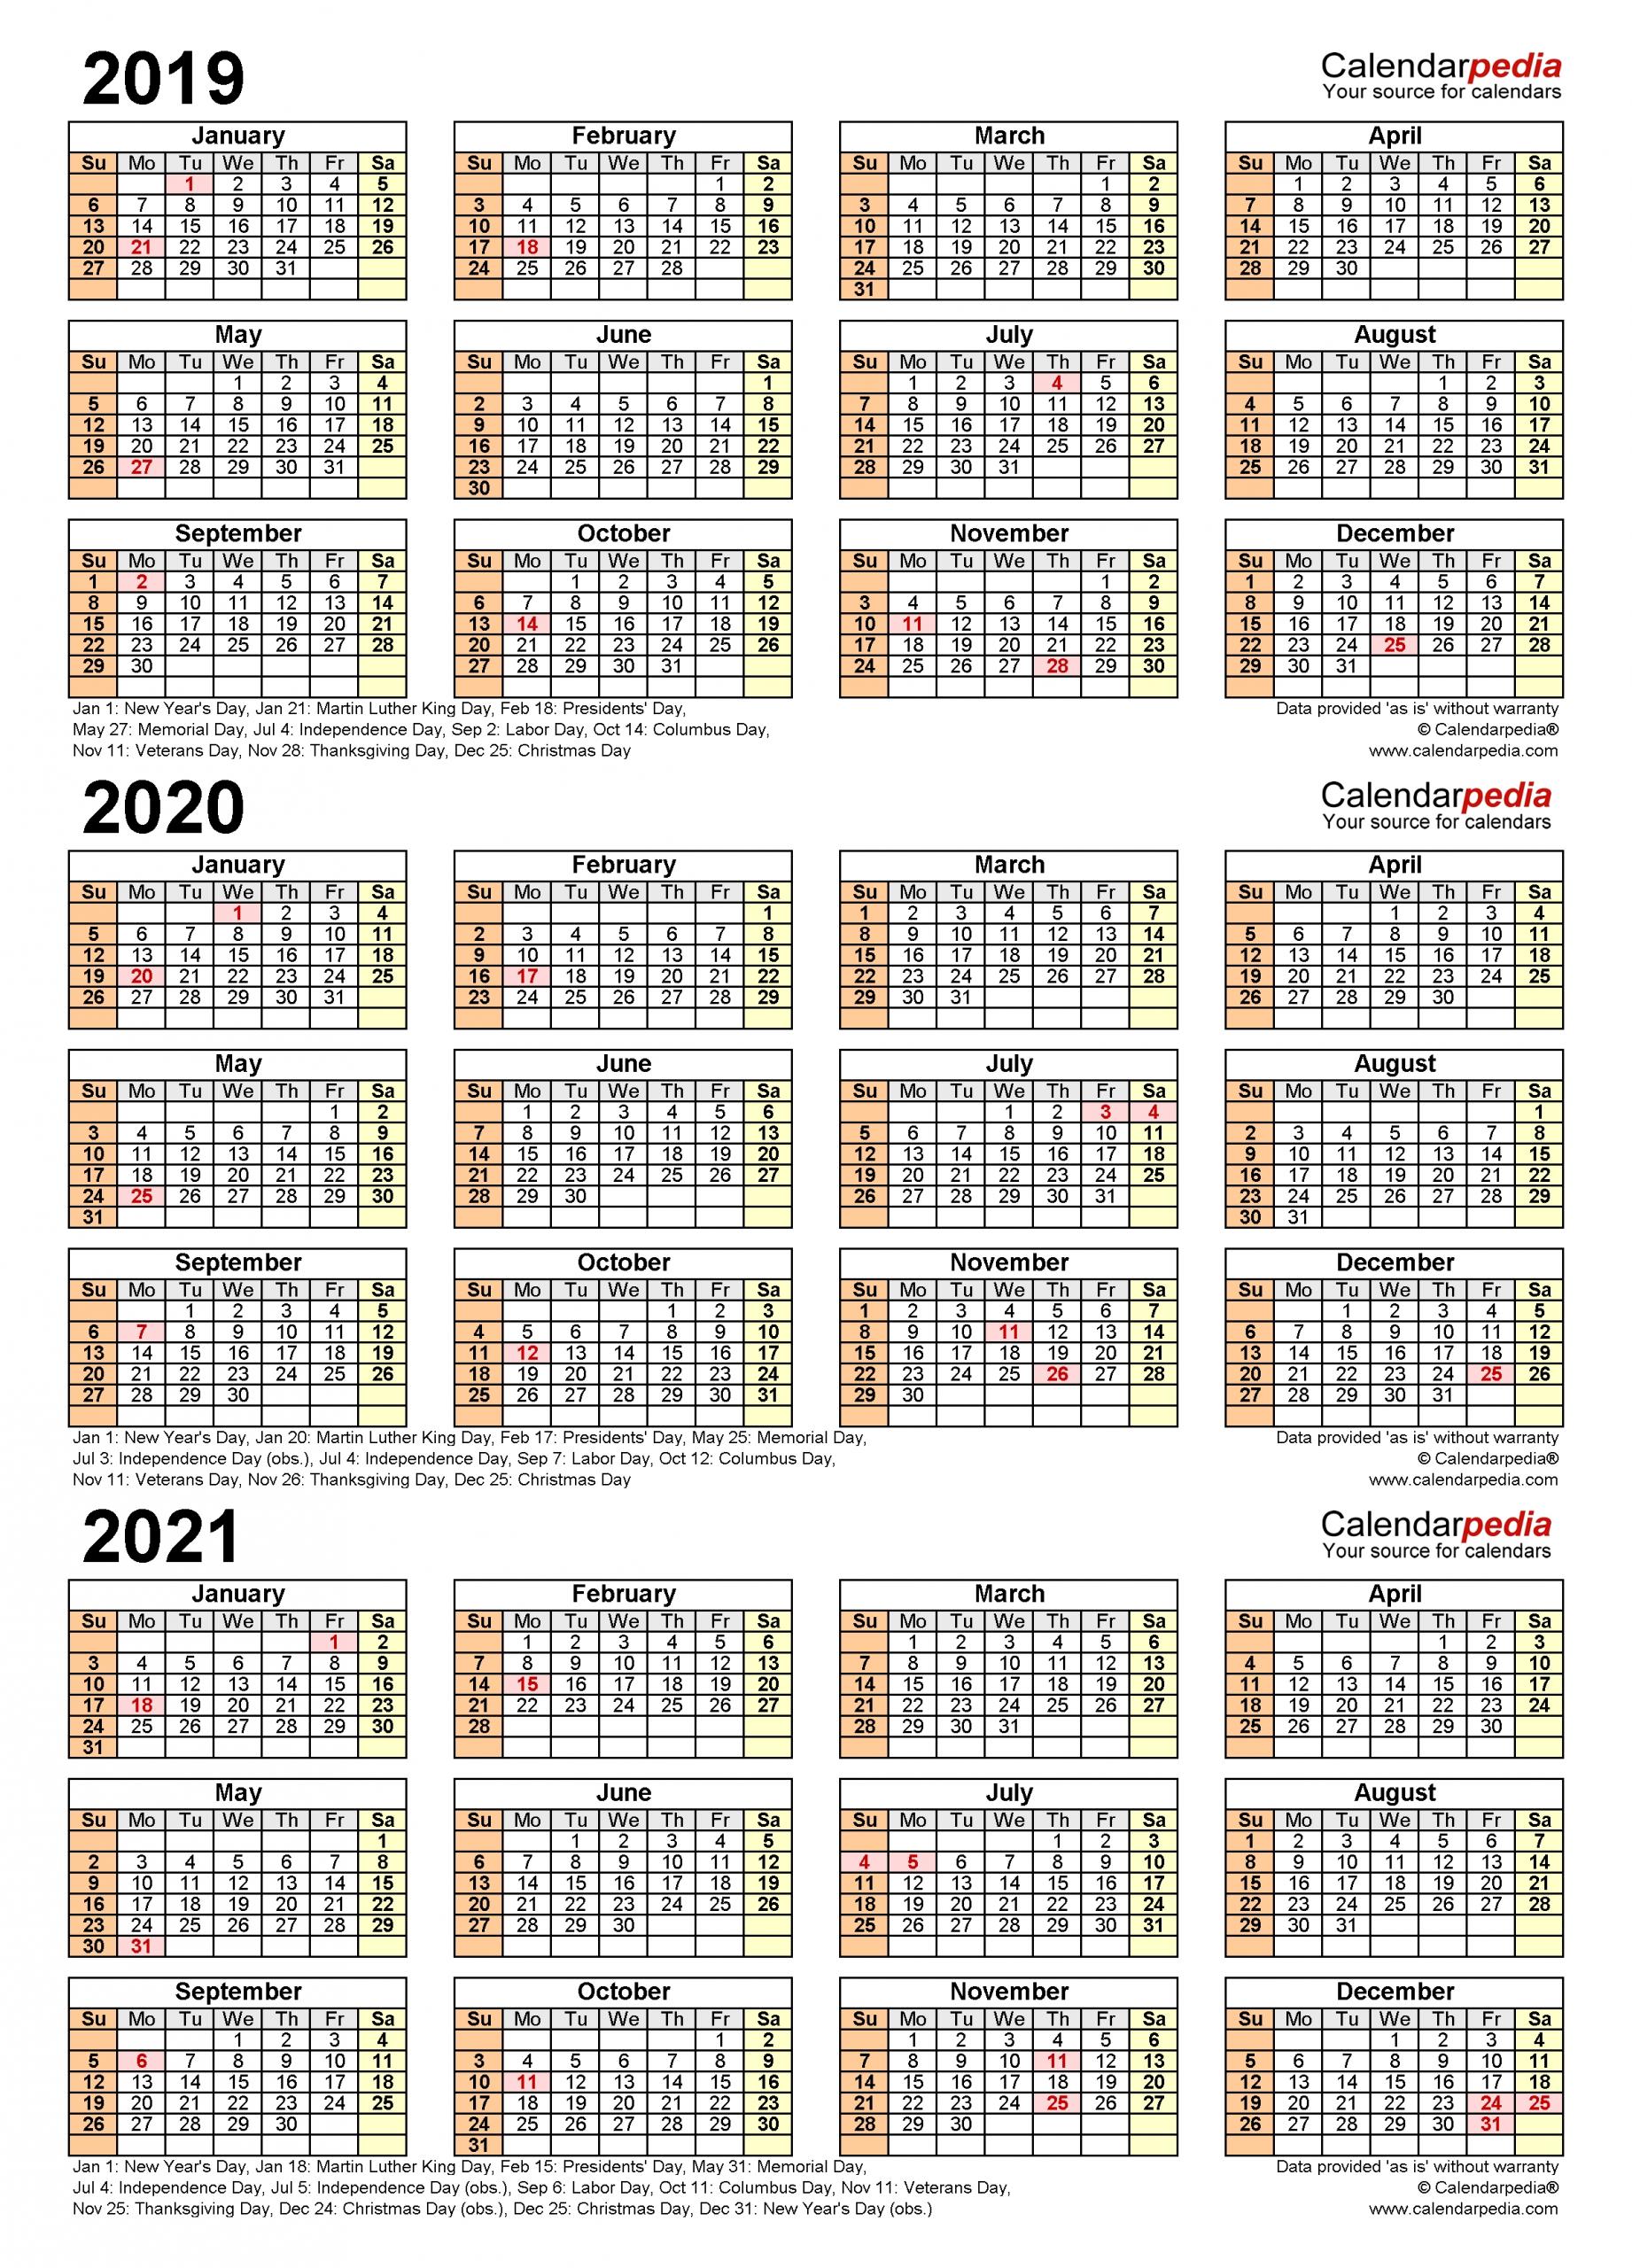 2019-2021 Three Year Calendar - Free Printable Pdf Templates in 3 Year Calendar 2019 2020 2021 Printable